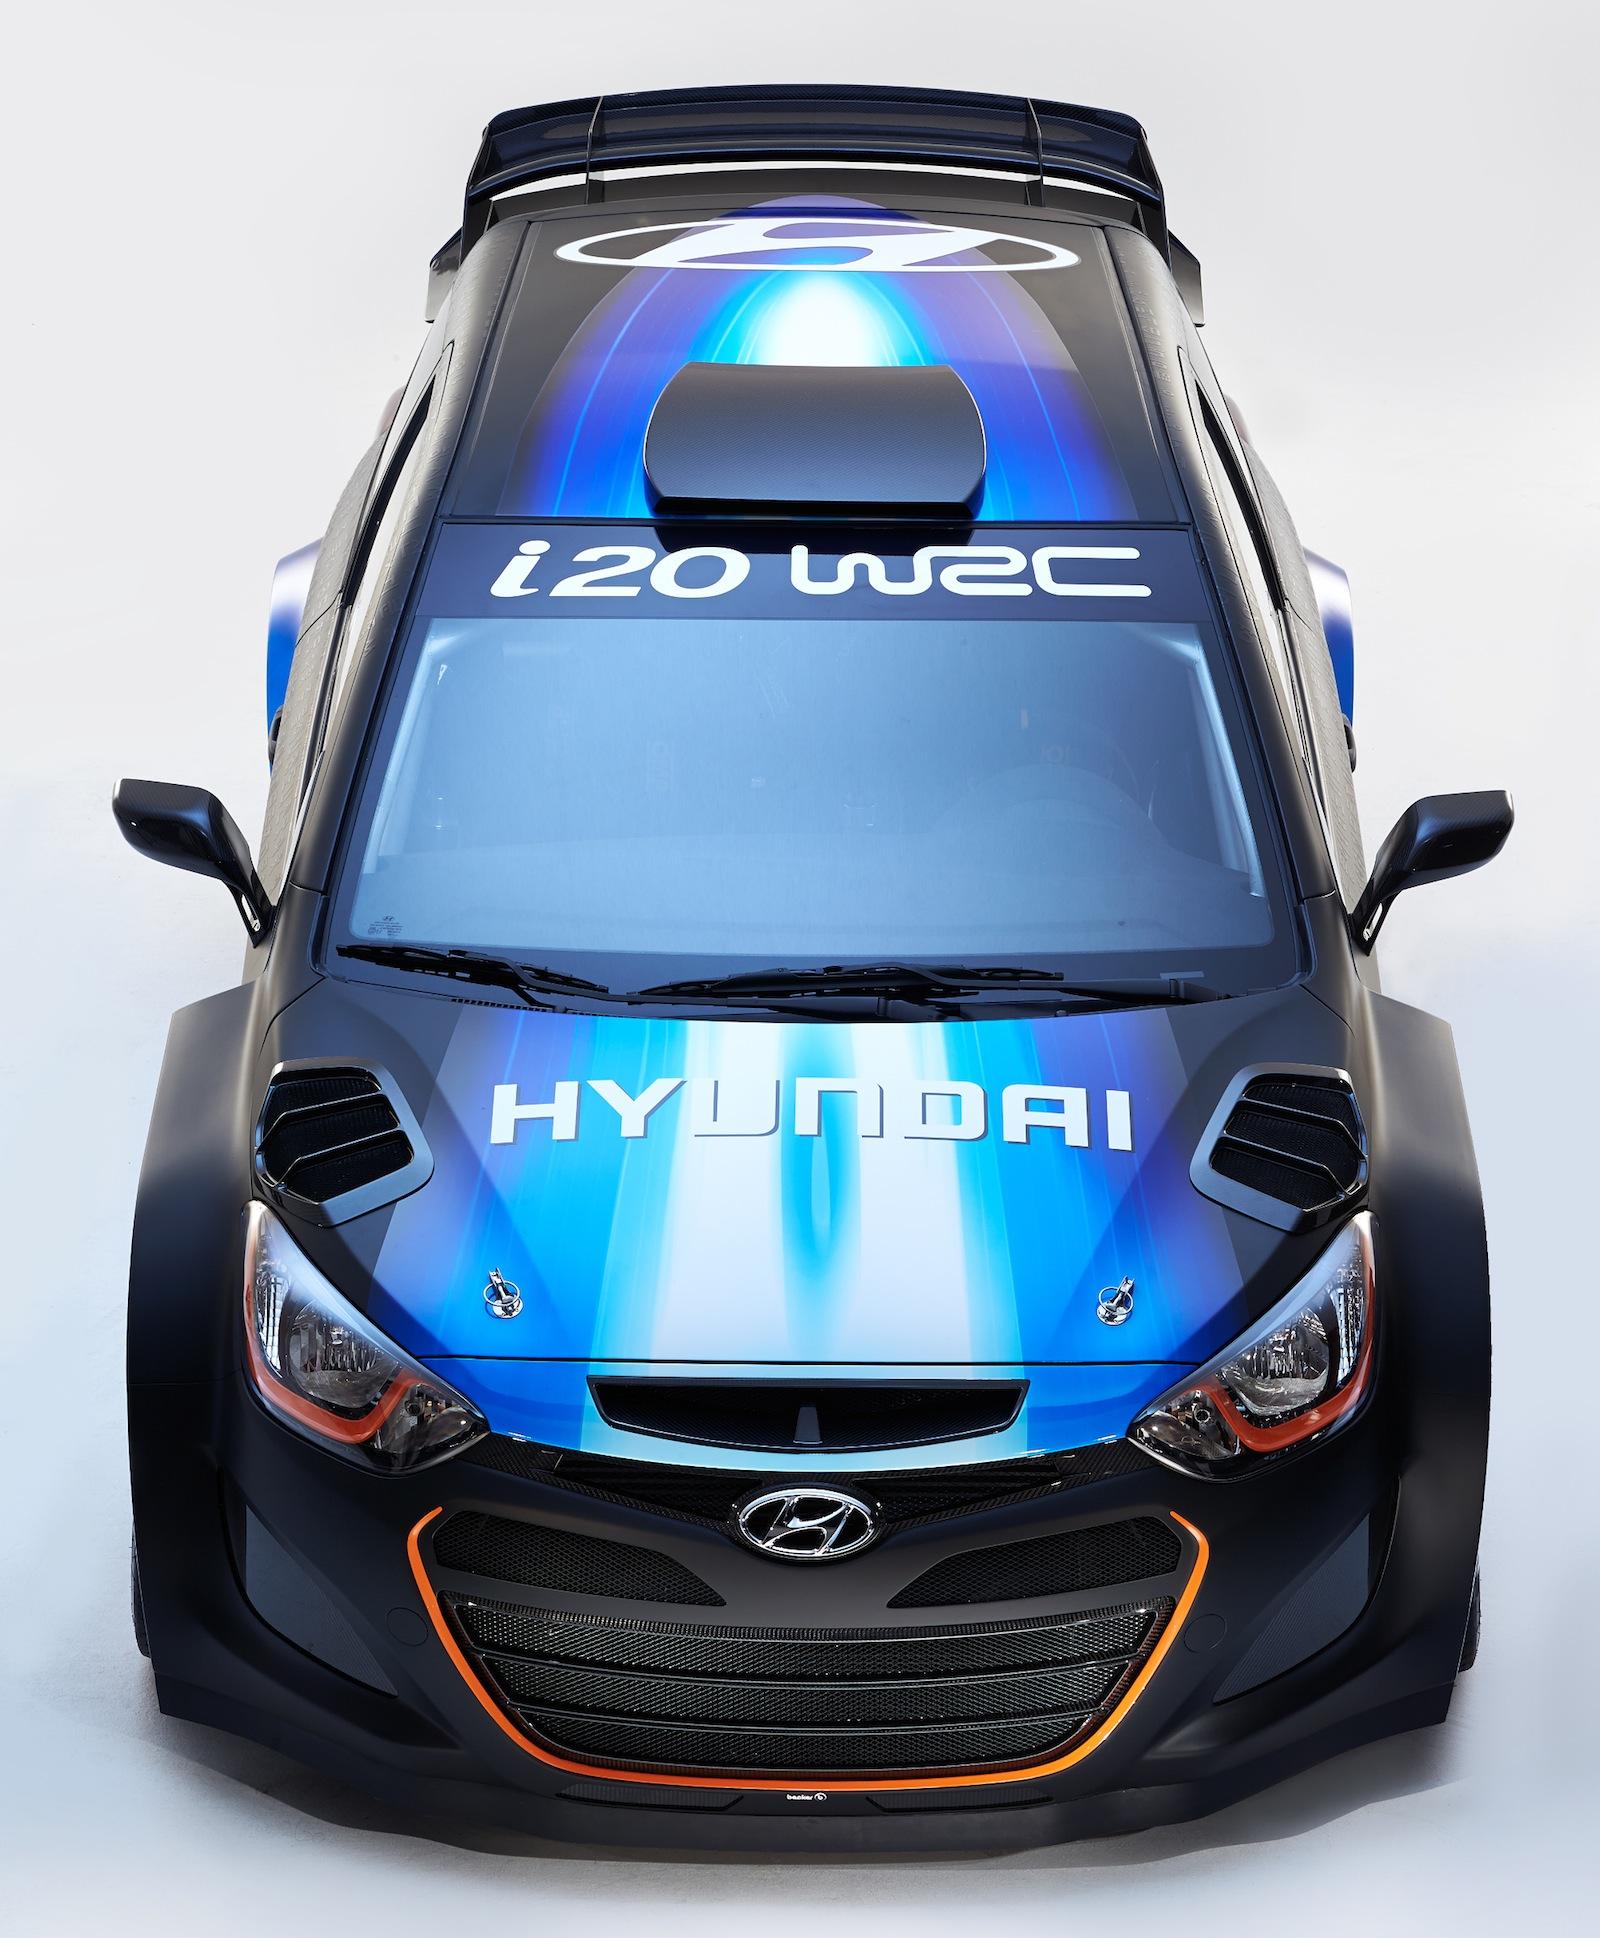 Hyundai I20 WRC: Upgraded Rally Car Unveiled At Geneva